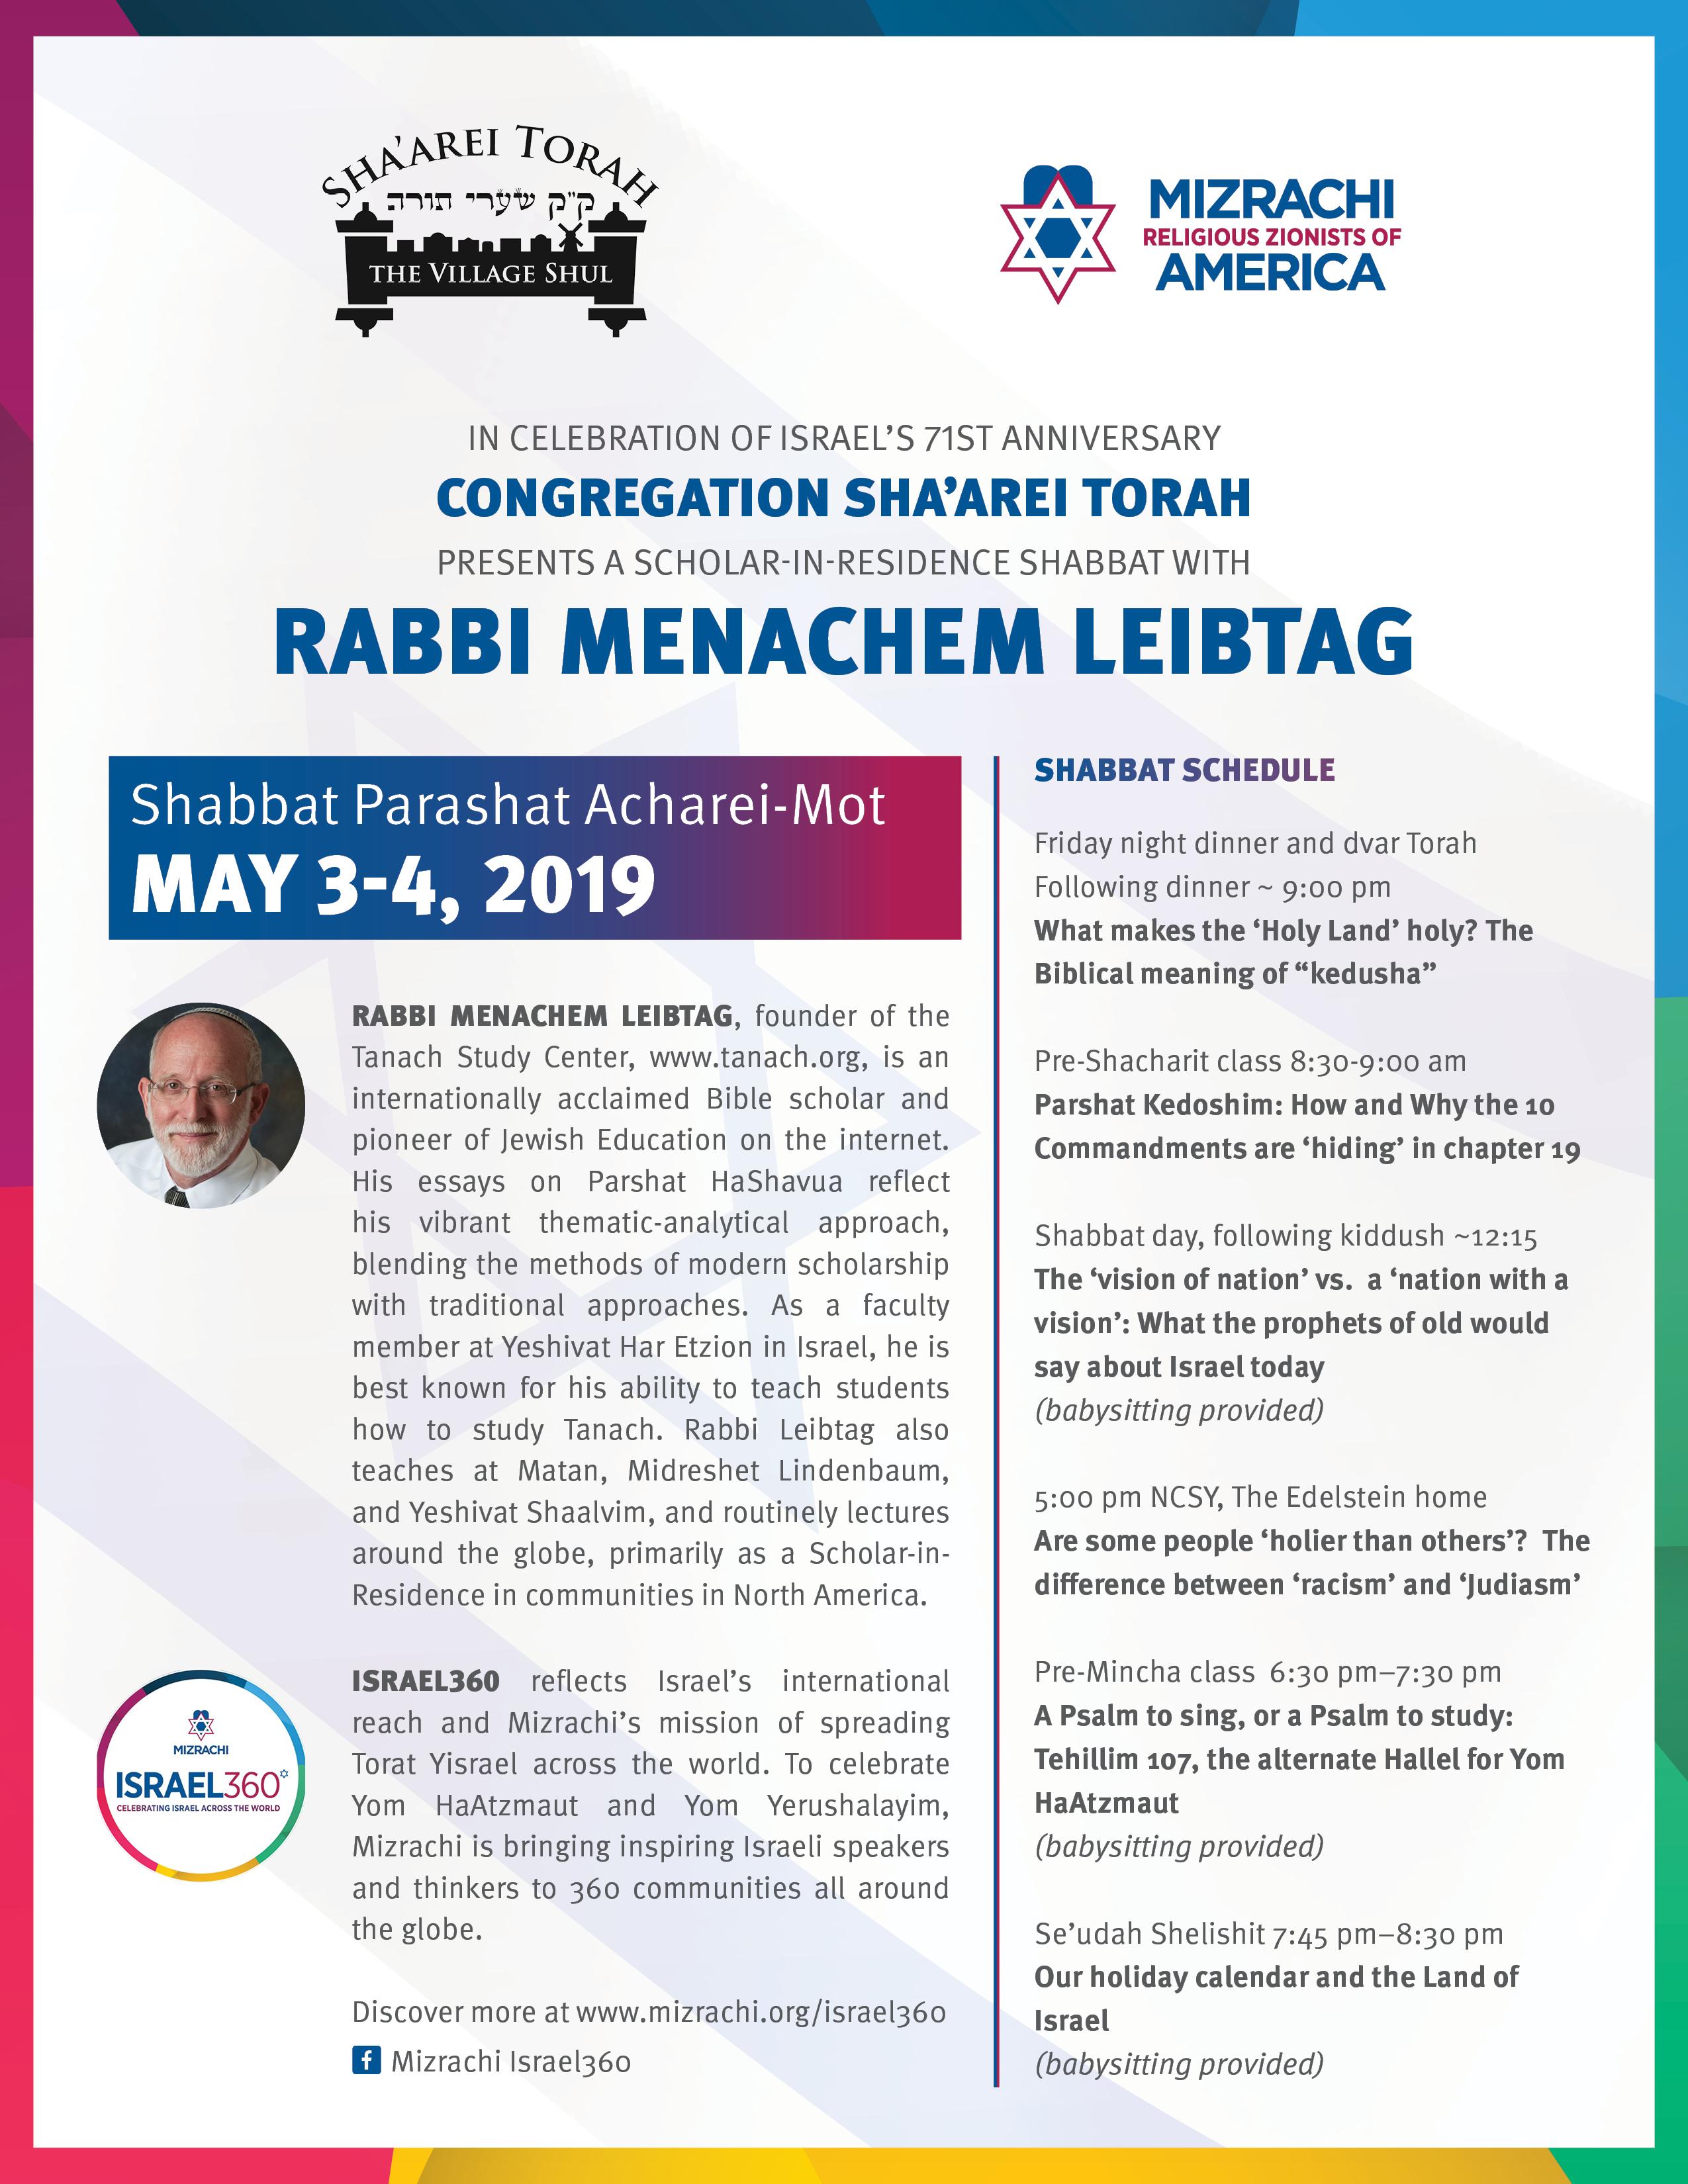 Israel360 – The Communities – World Mizrachi